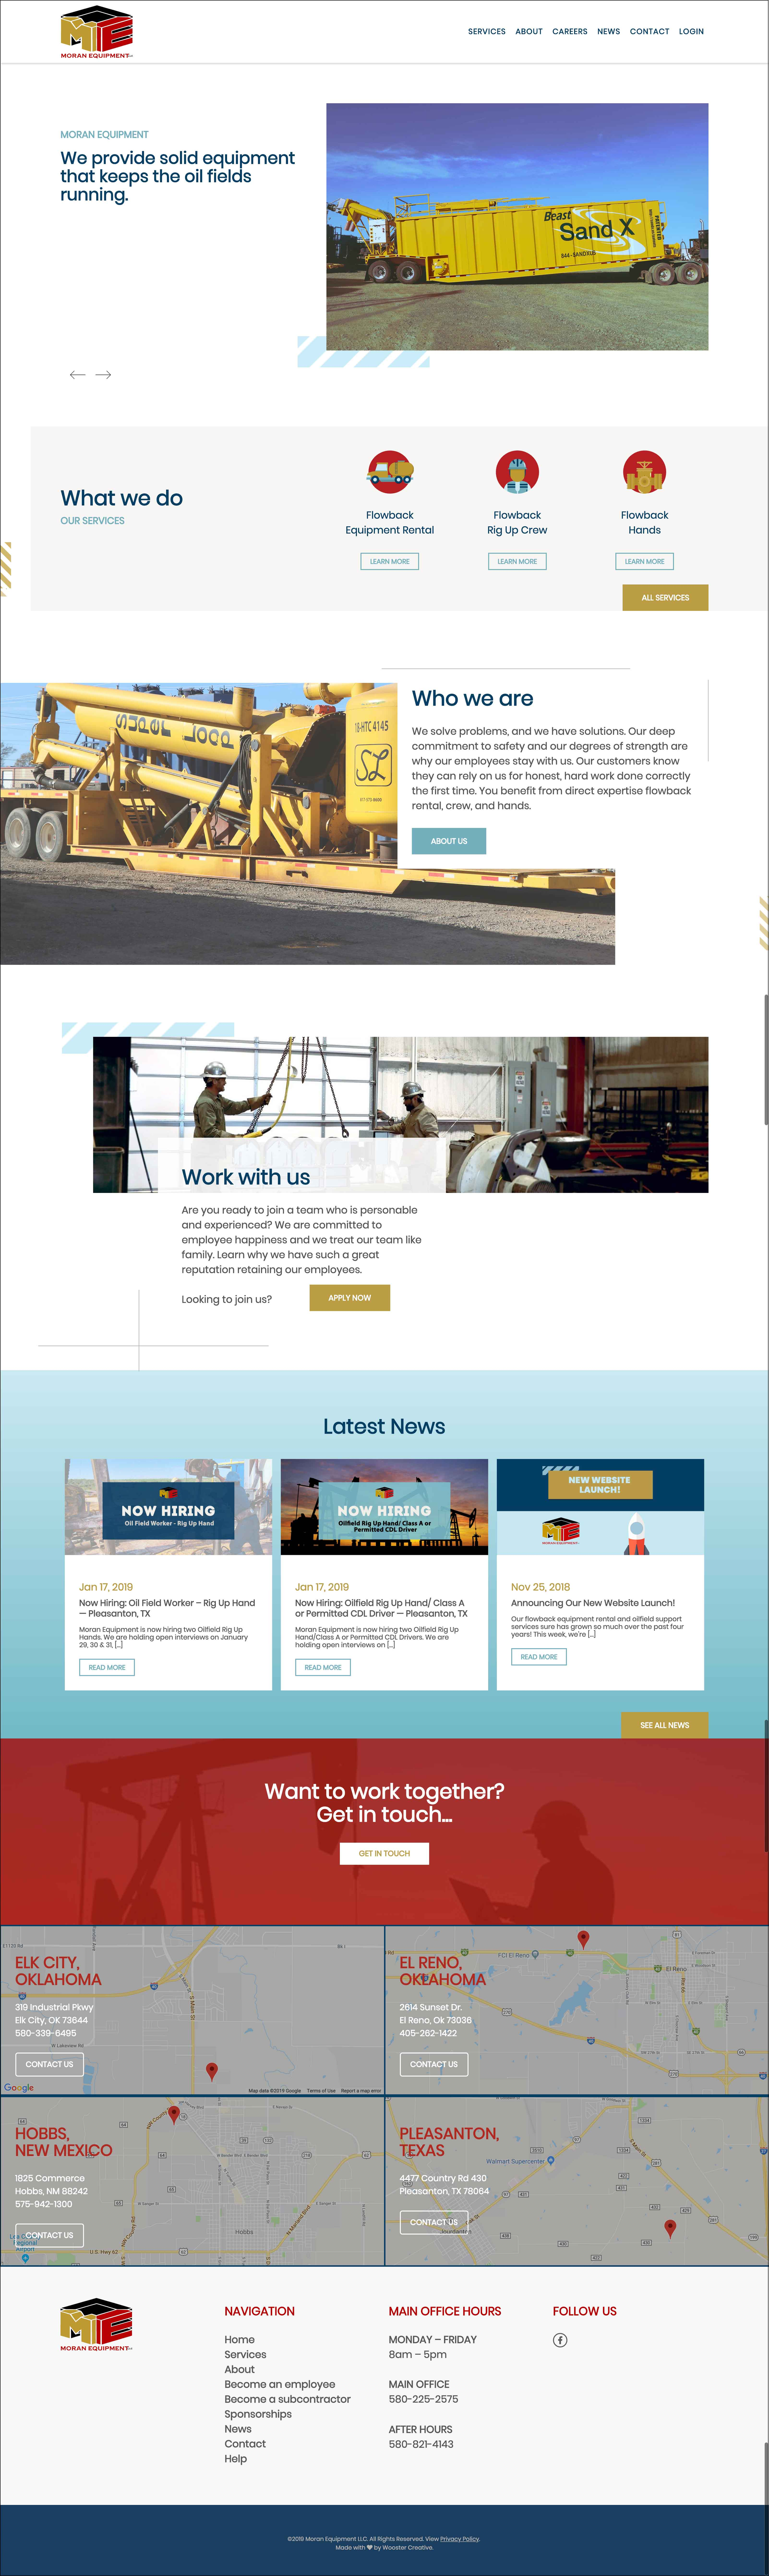 okc website design - wordpress design and development OKC